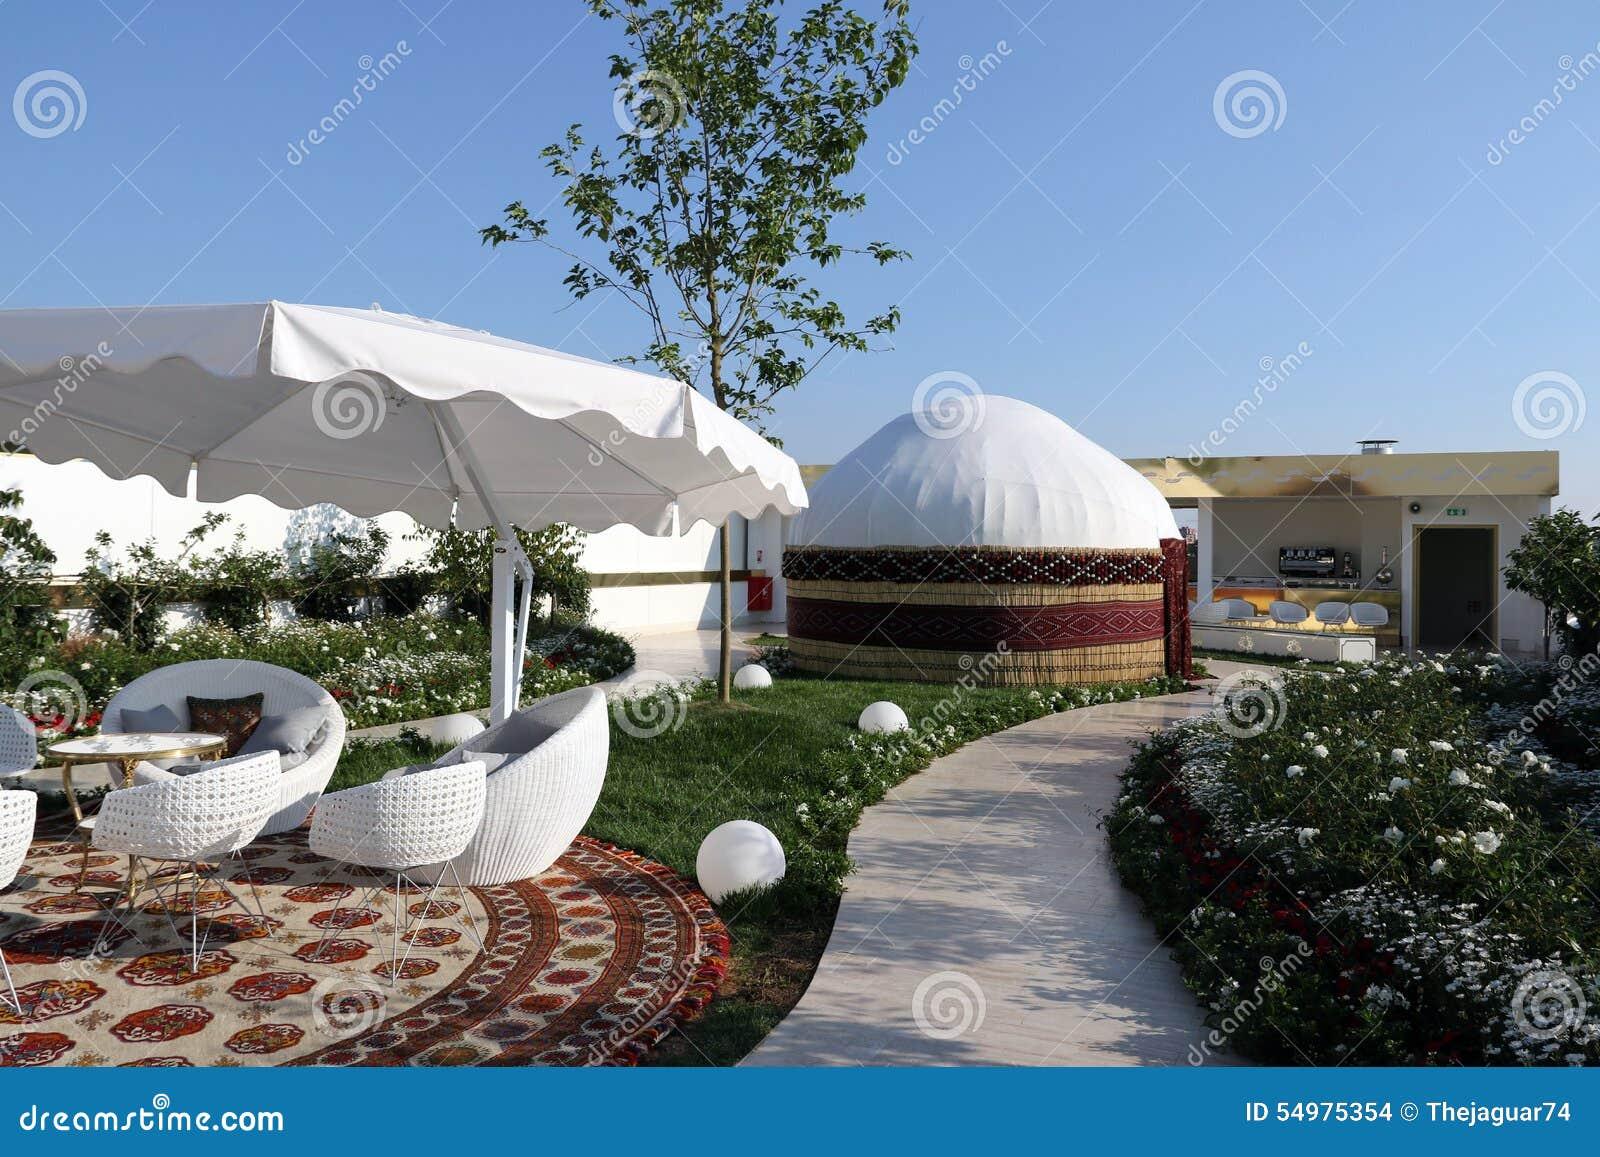 Turkmenistan paviljong Milan, milano expo 2015